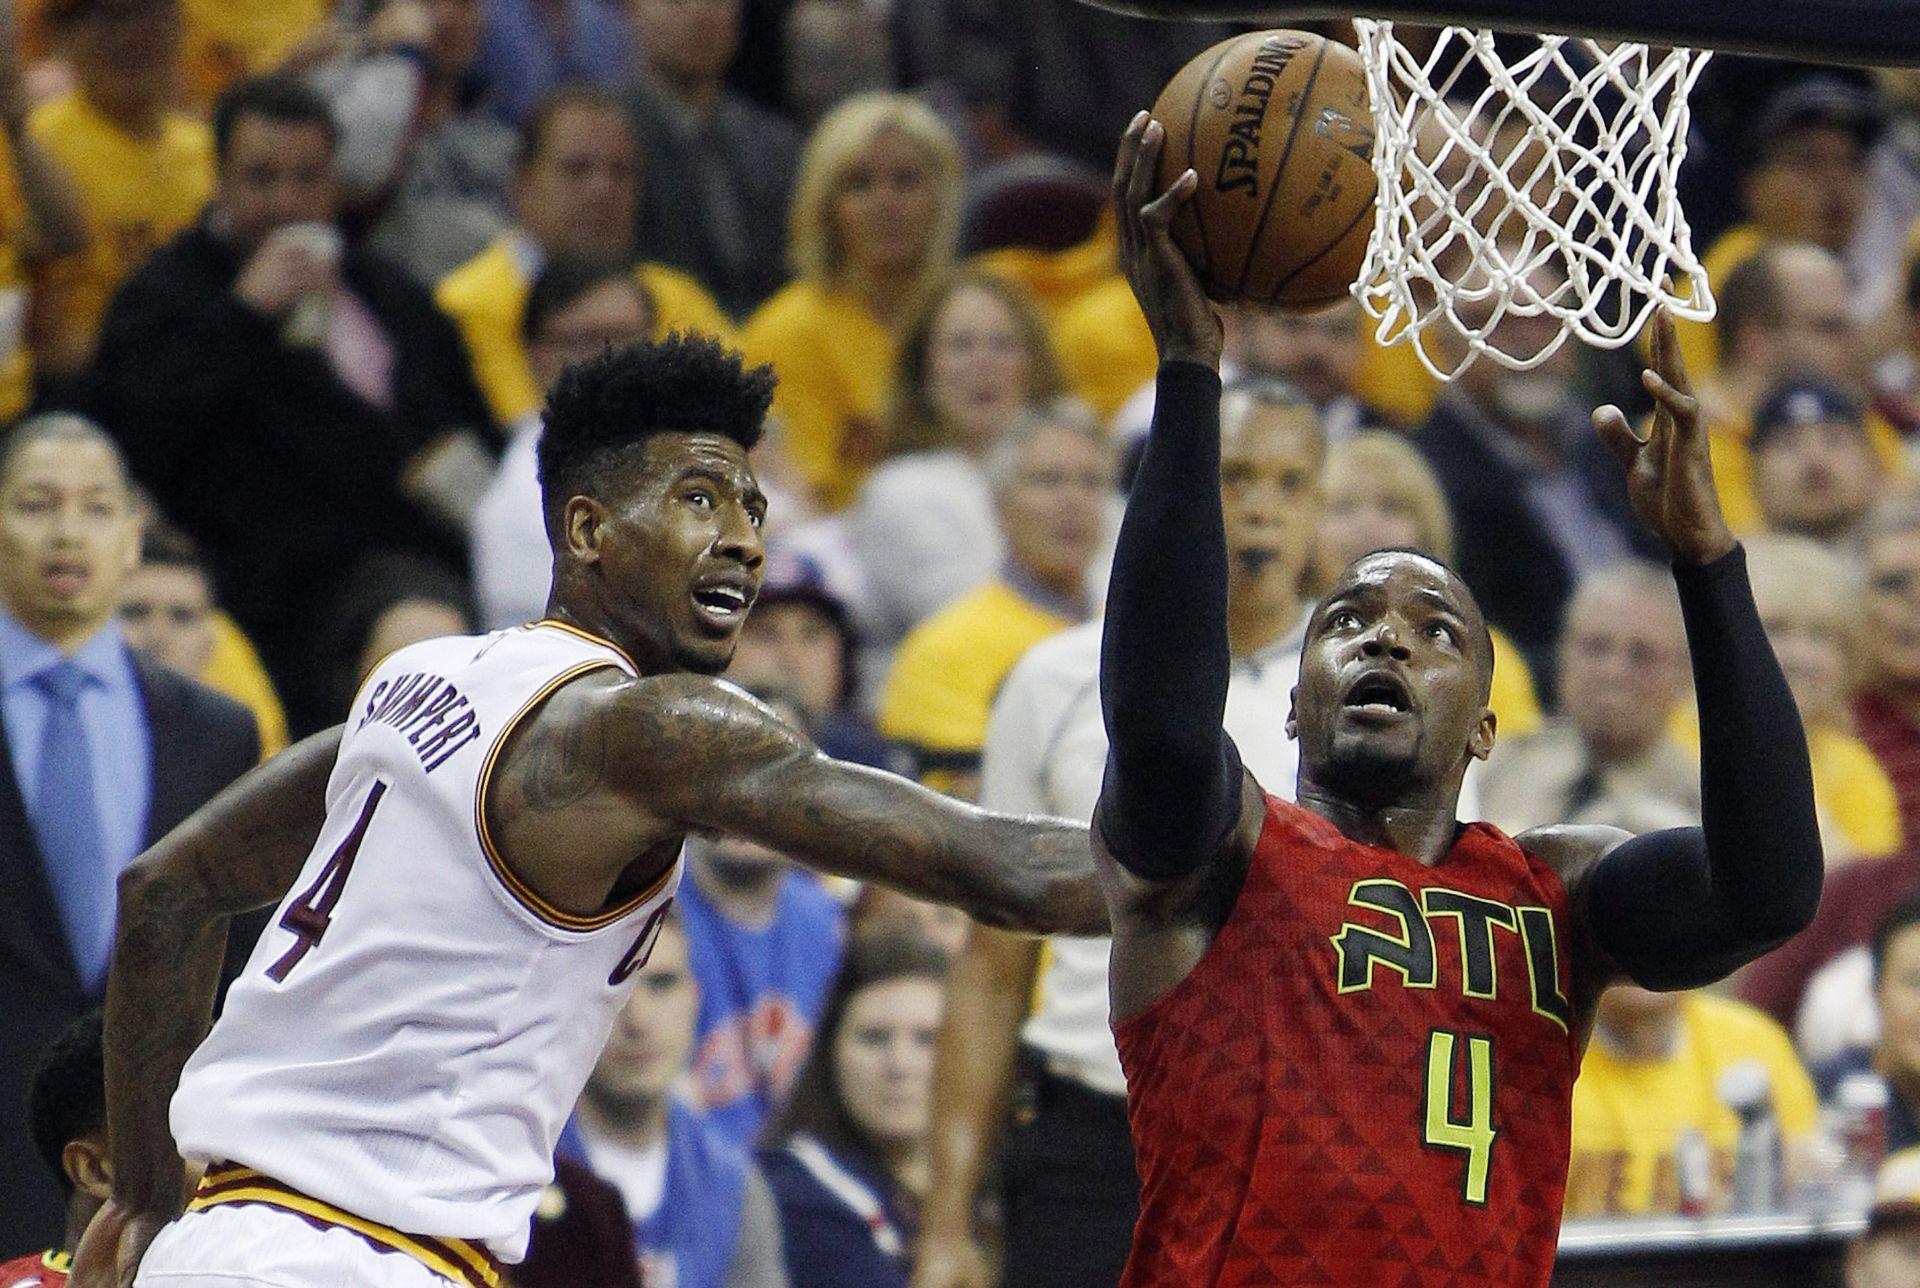 NBA: Cleveland poveo sa 2-0 uz rekordnih 25 trica